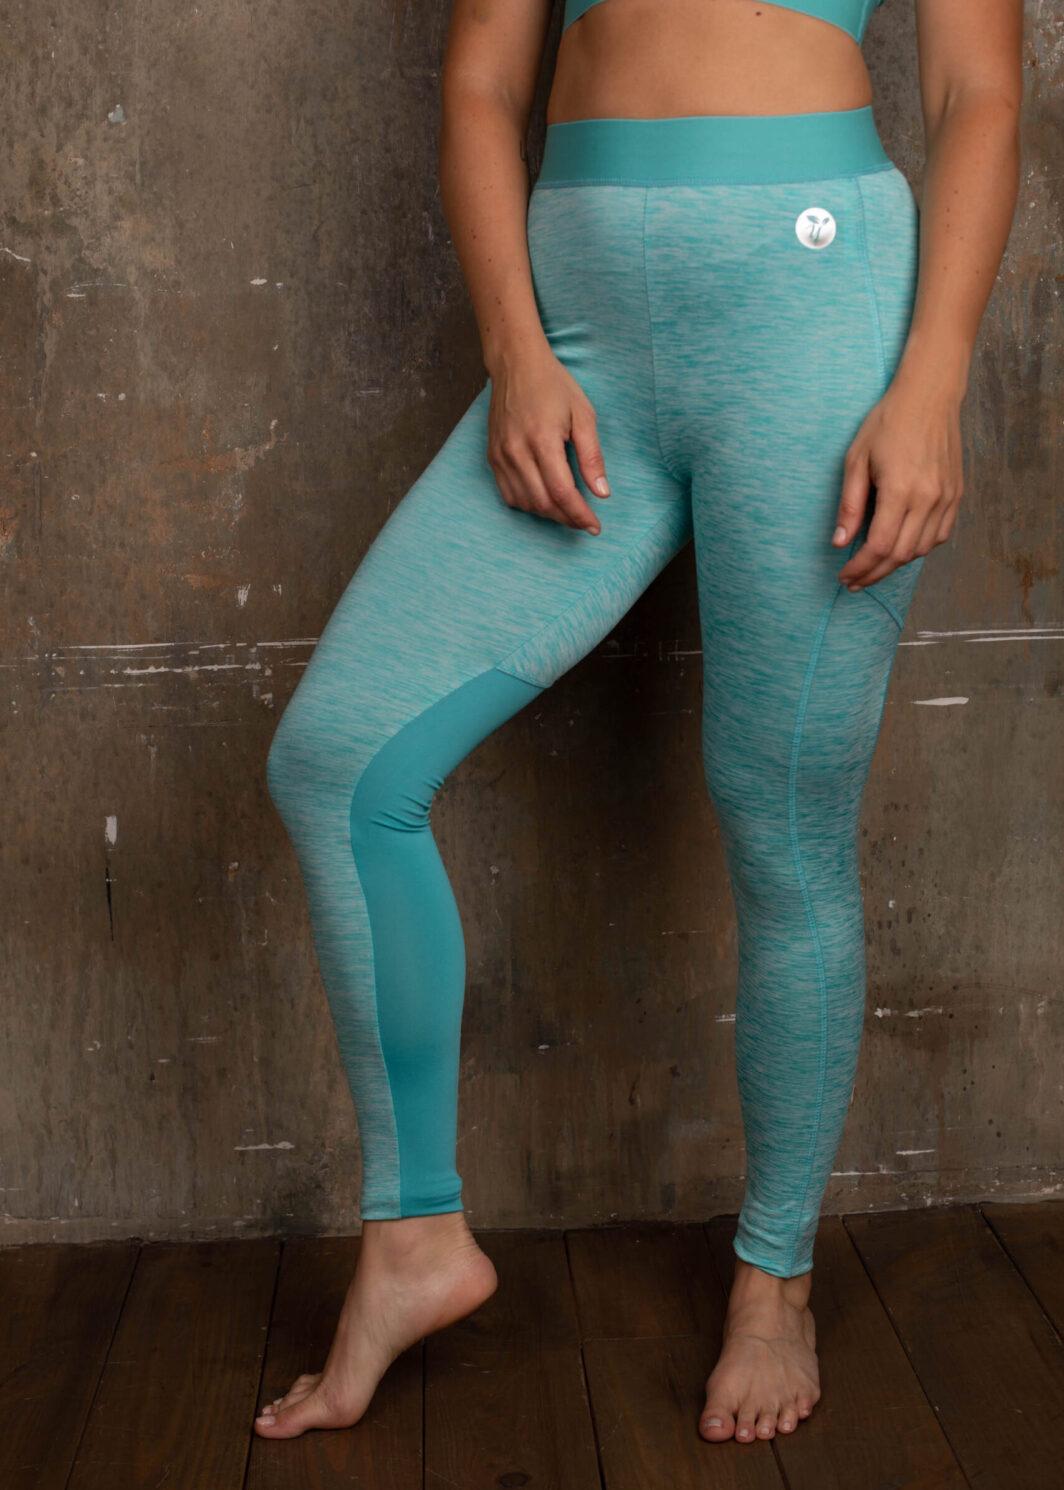 YOGETTE | Leggings pantalone sportivo MYKONOS - Yoga - Pilates